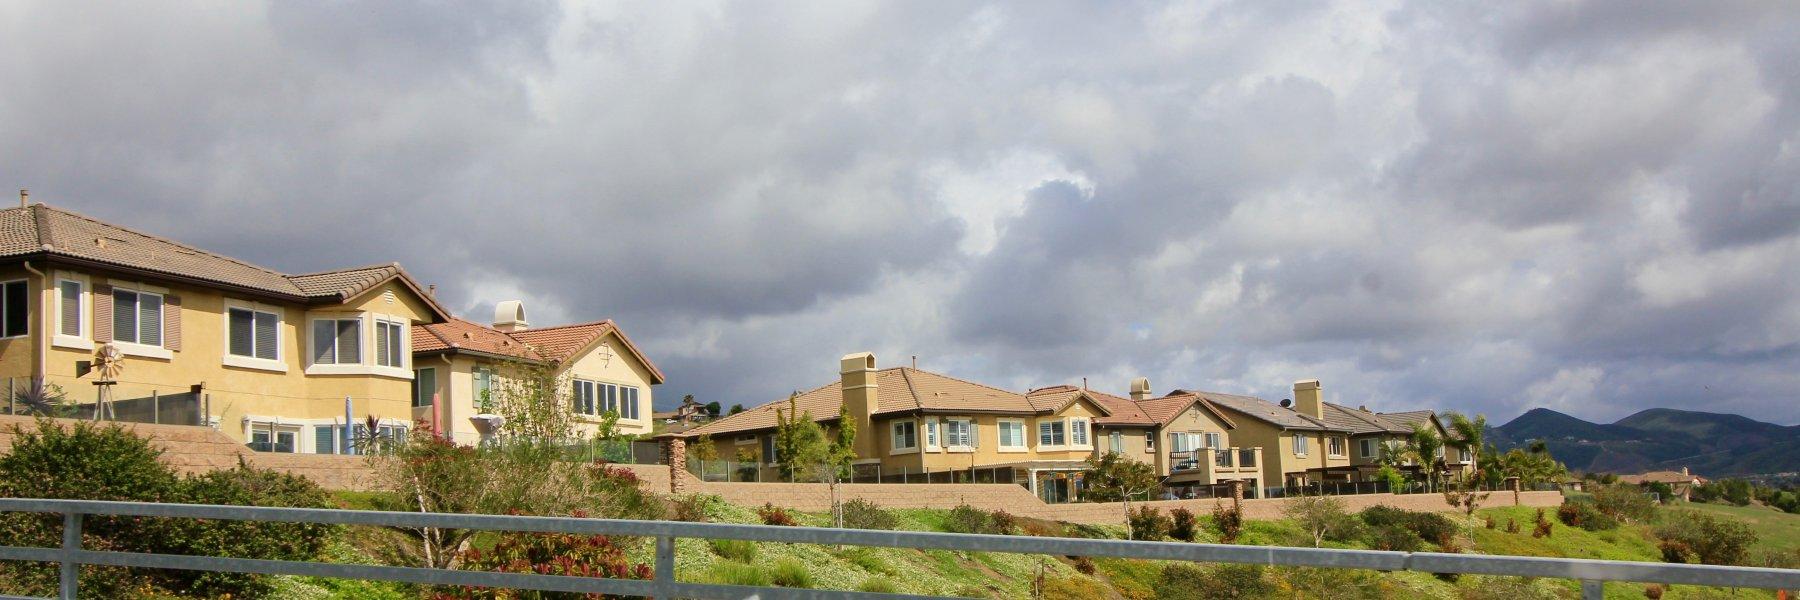 Rancho Santalina is a community of homes in San Marcos California